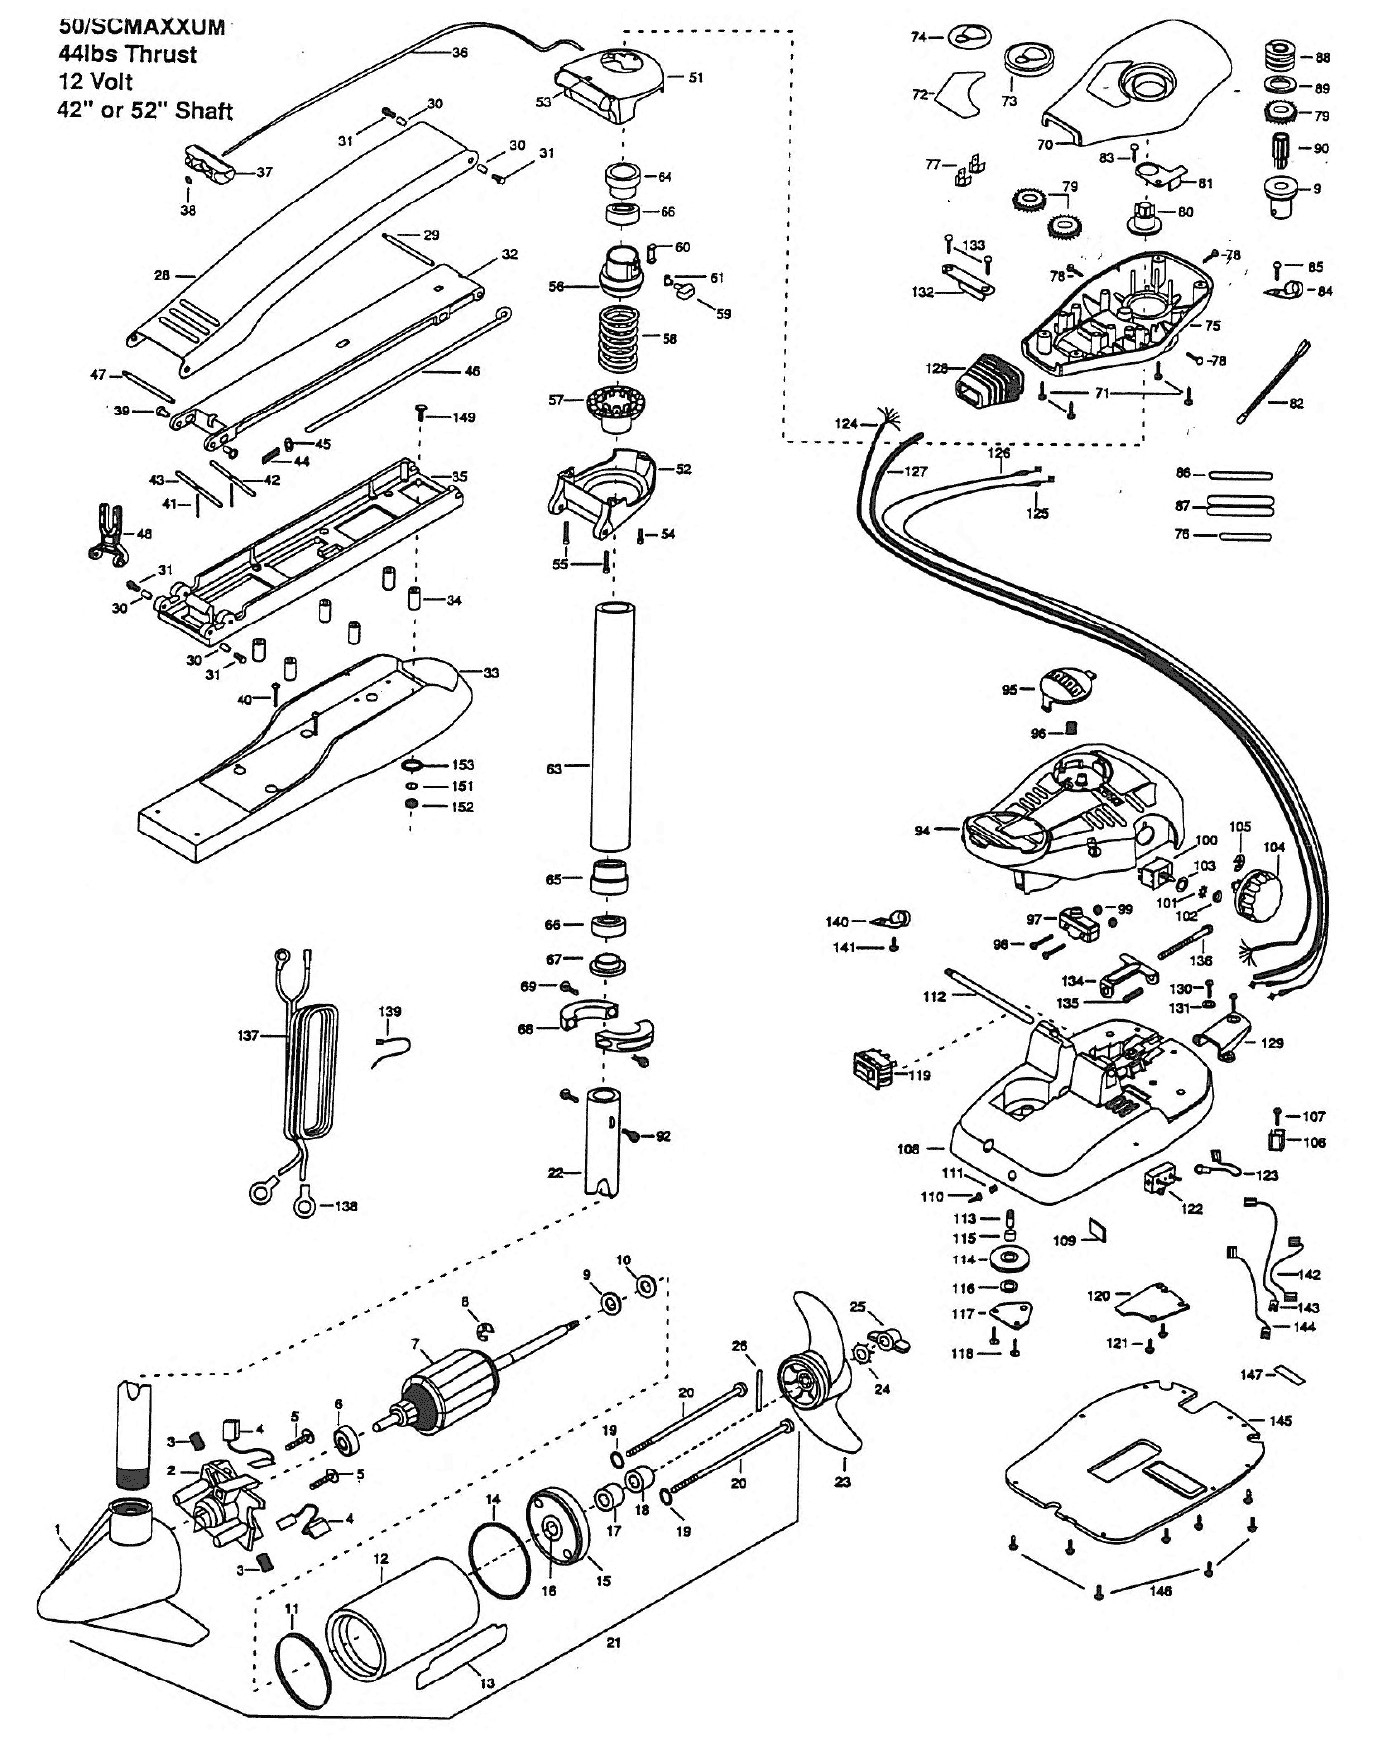 wiring diagram manual induction motor 3 phase minn kota trolling size chart impremedia